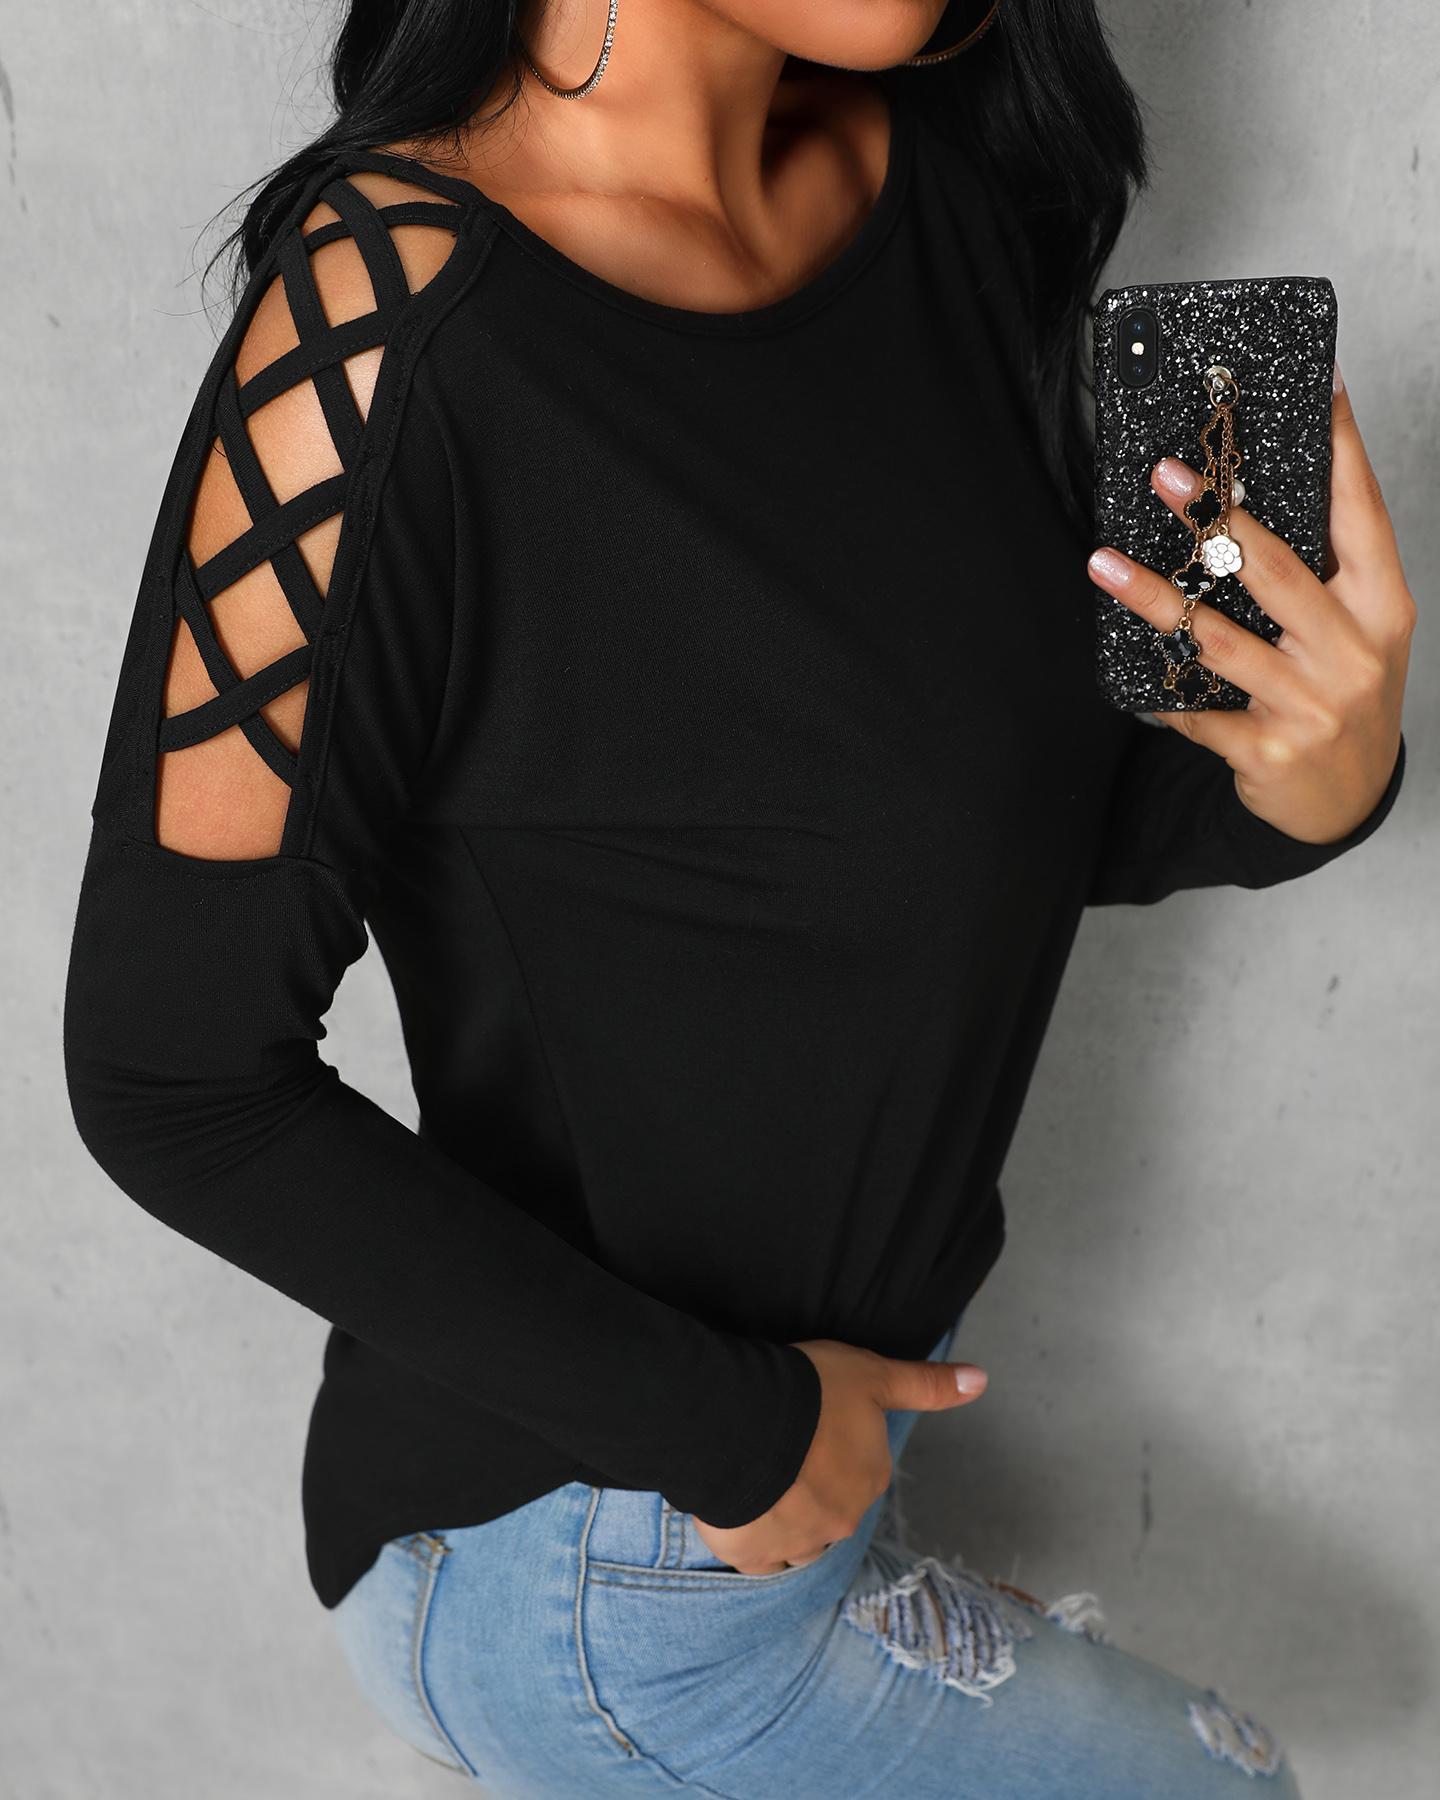 Sexy Black Lace-up Shoulder High-low Trim Top